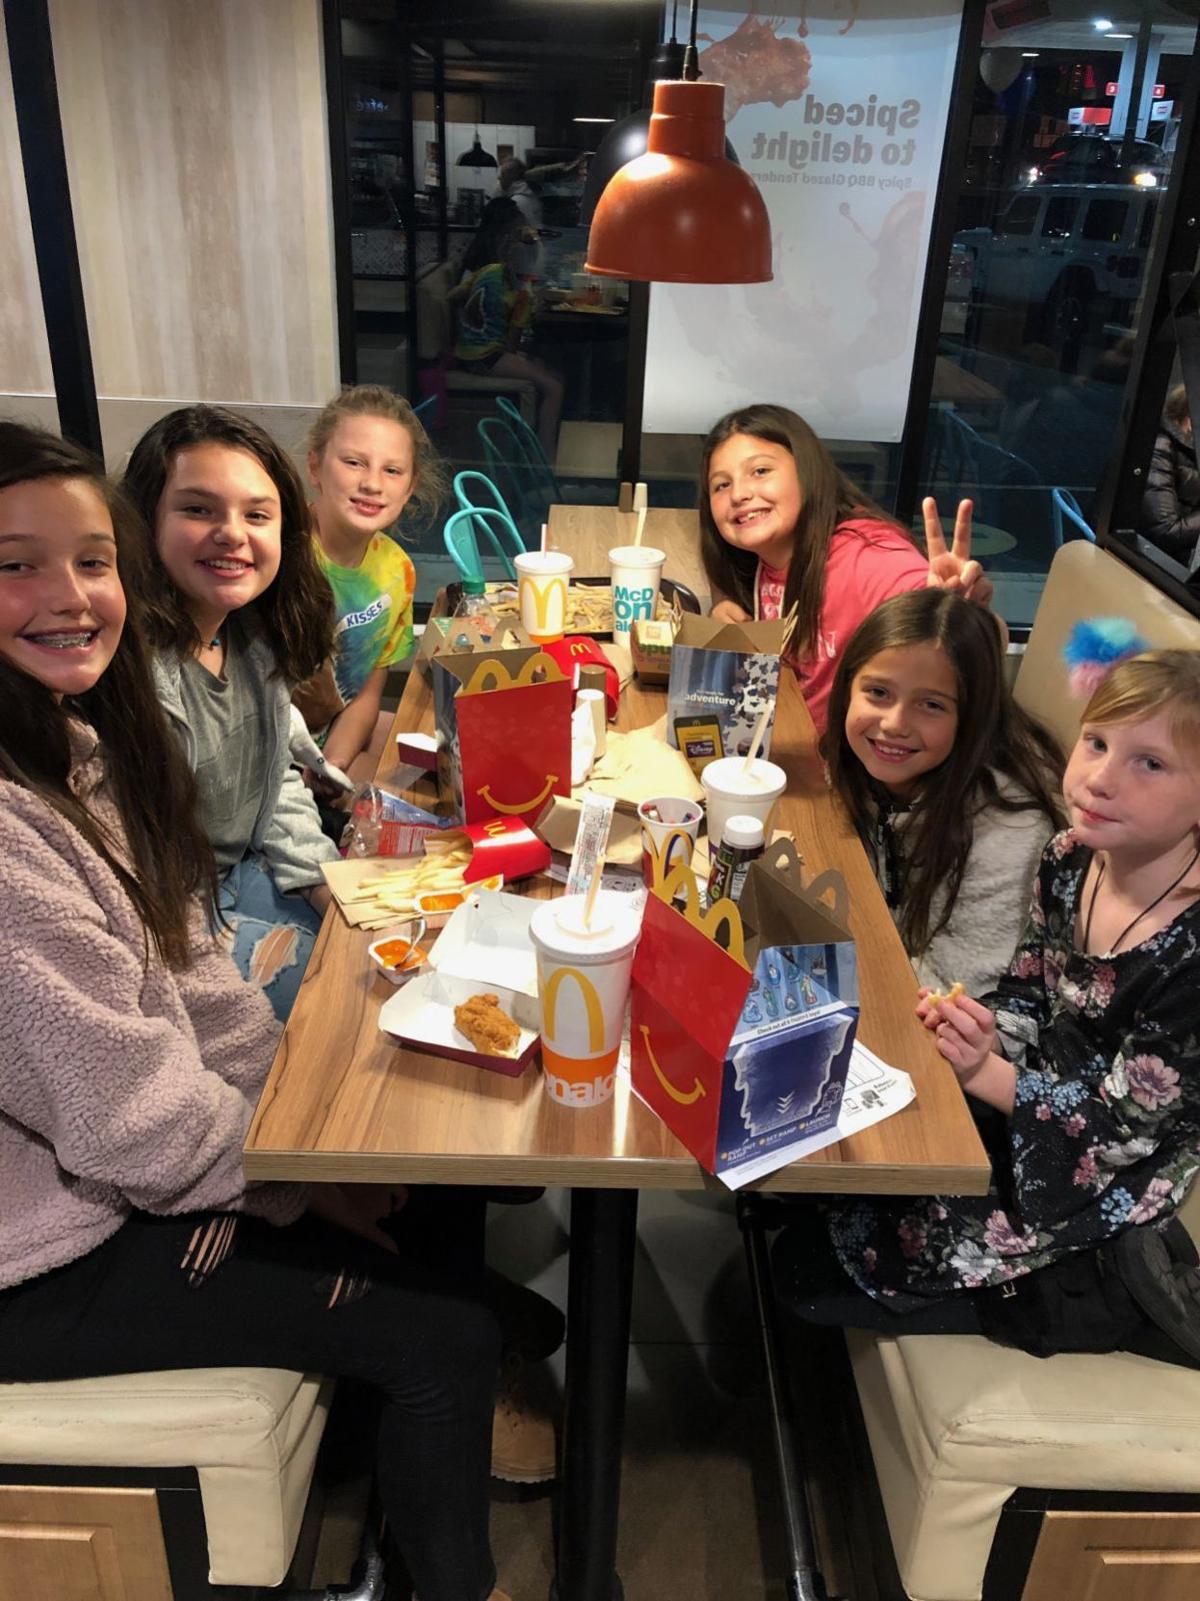 Dennis Township Middle School 6th grade McDonald's fundraiser